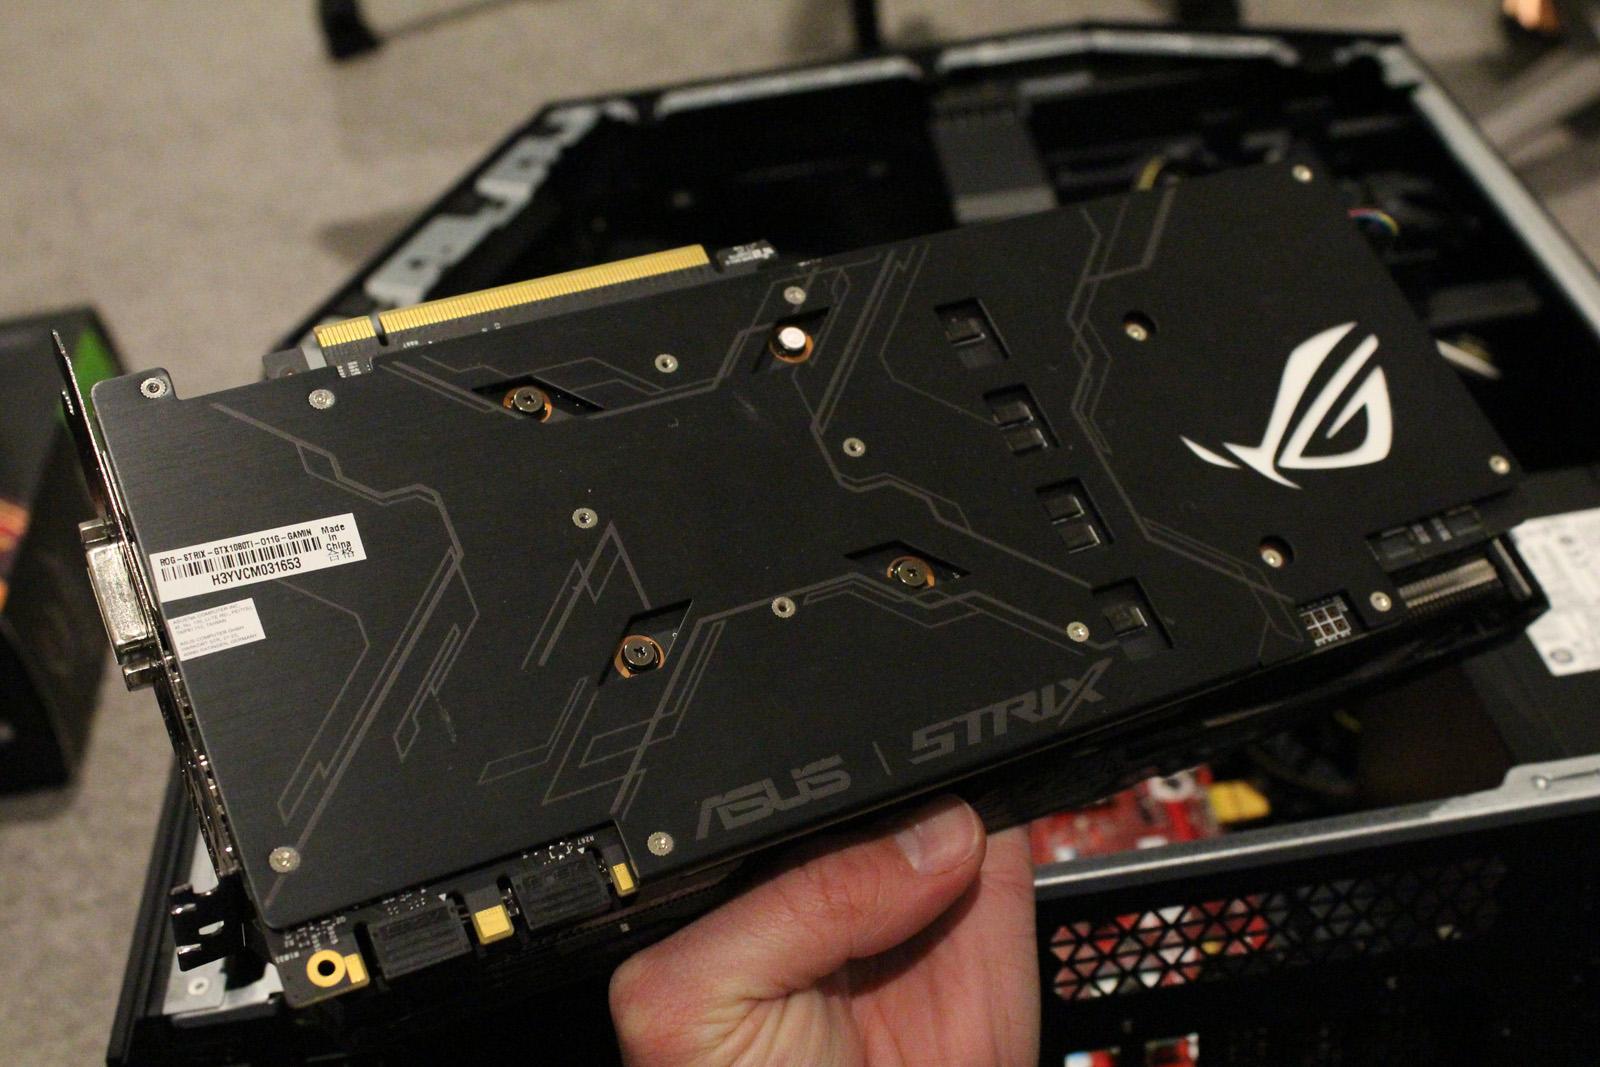 Review: ASUS GeForce GTX 1080 Ti ROG Strix Gaming 11GB GPU OC